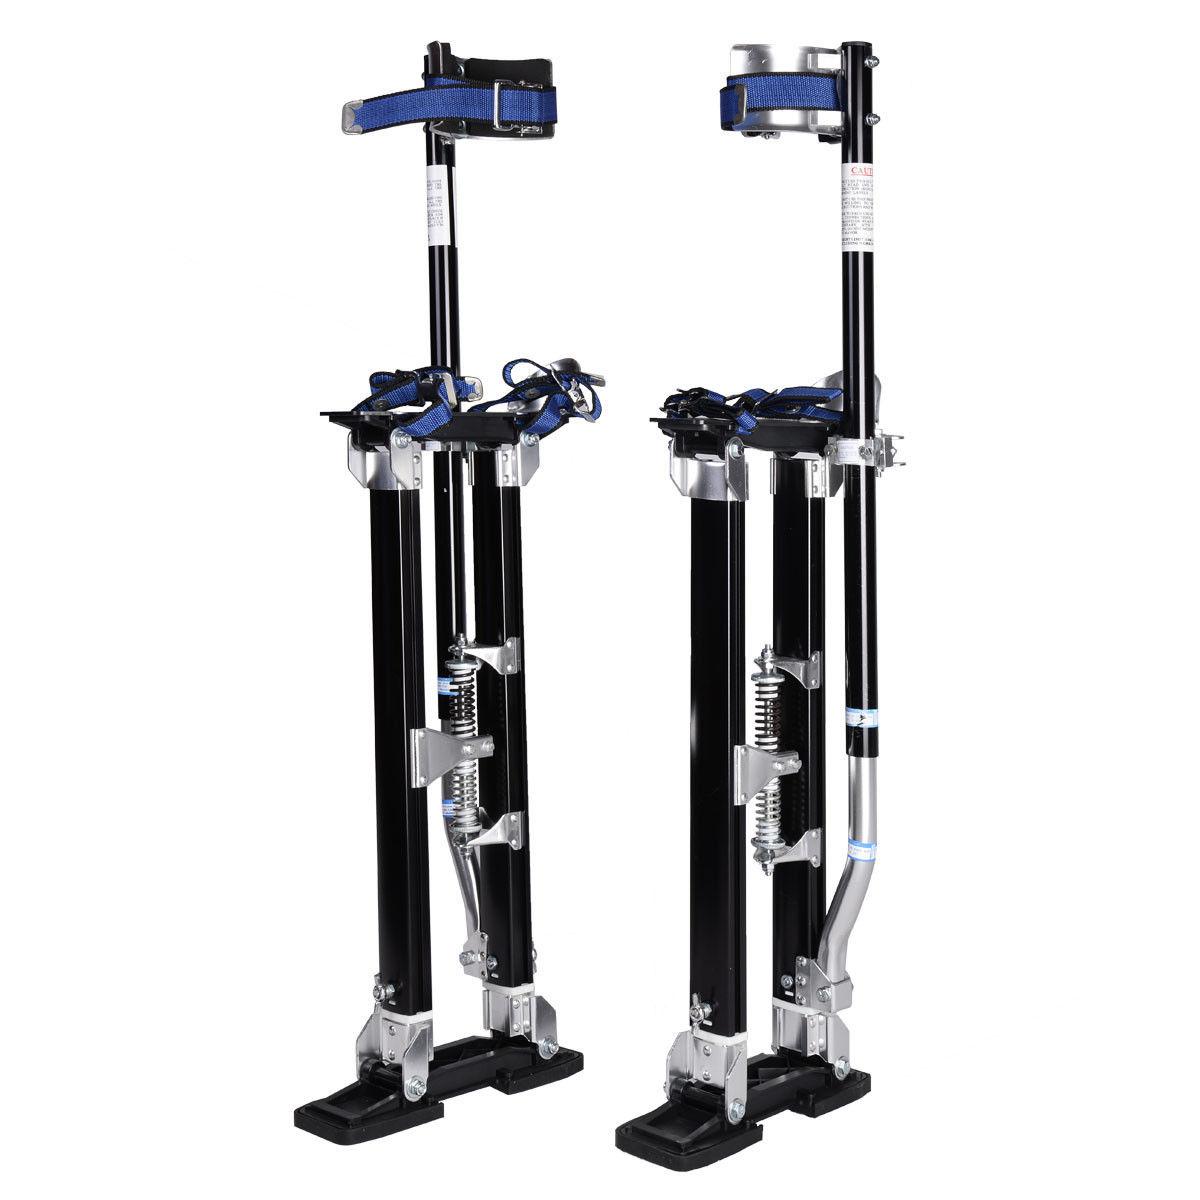 24-40 Inch Drywall Stilts Aluminum Tool Stilt For Painting Painter Taping